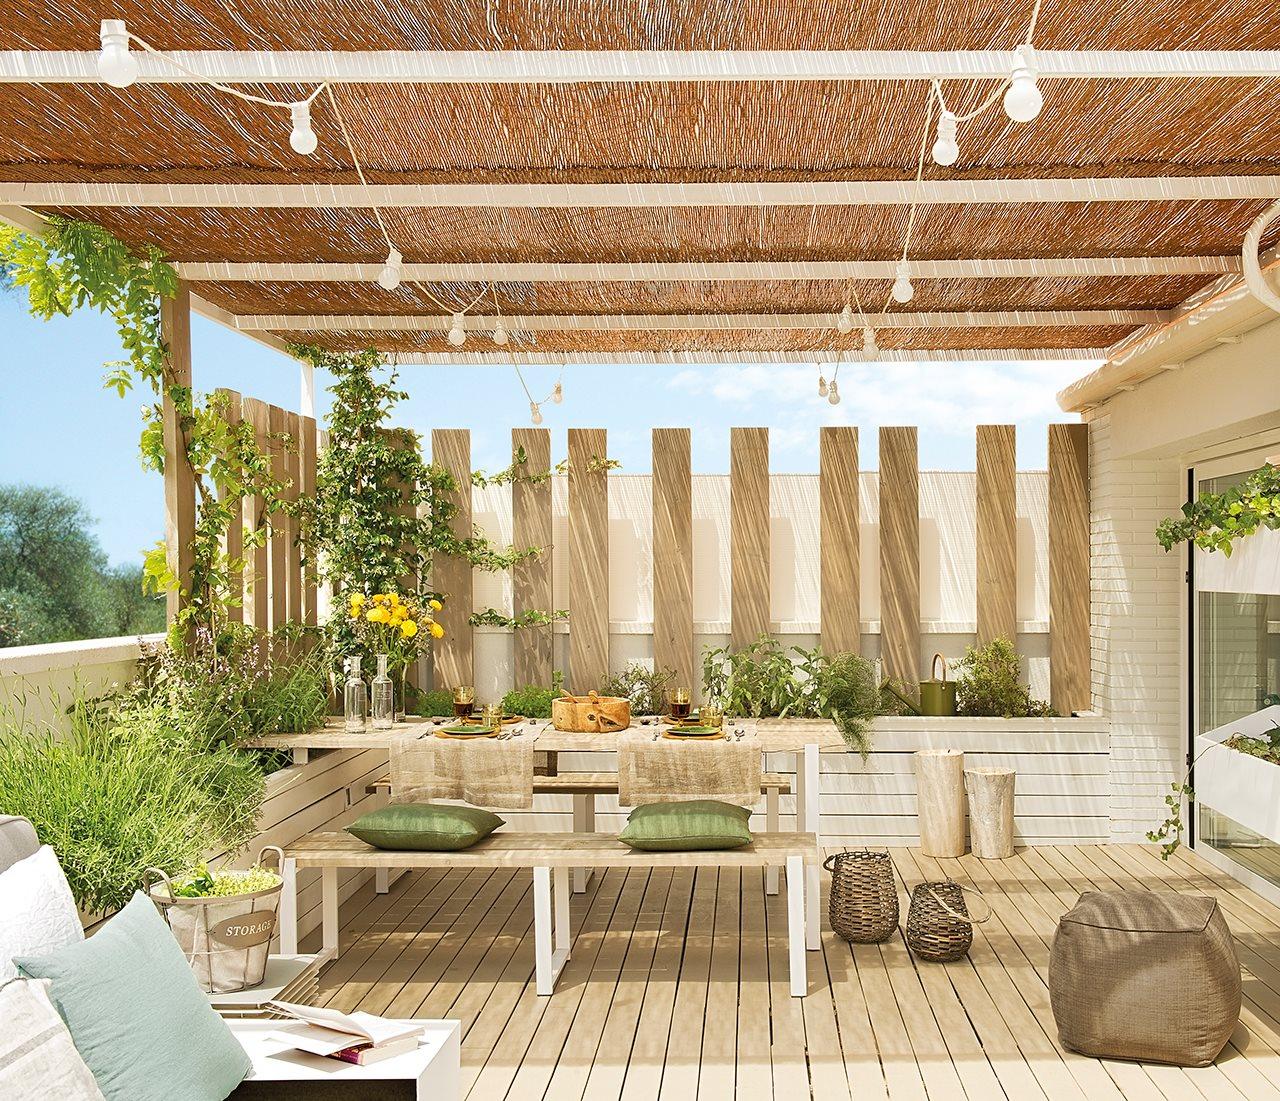 Tres porches tres estilos - Arredare balconi e terrazzi ...